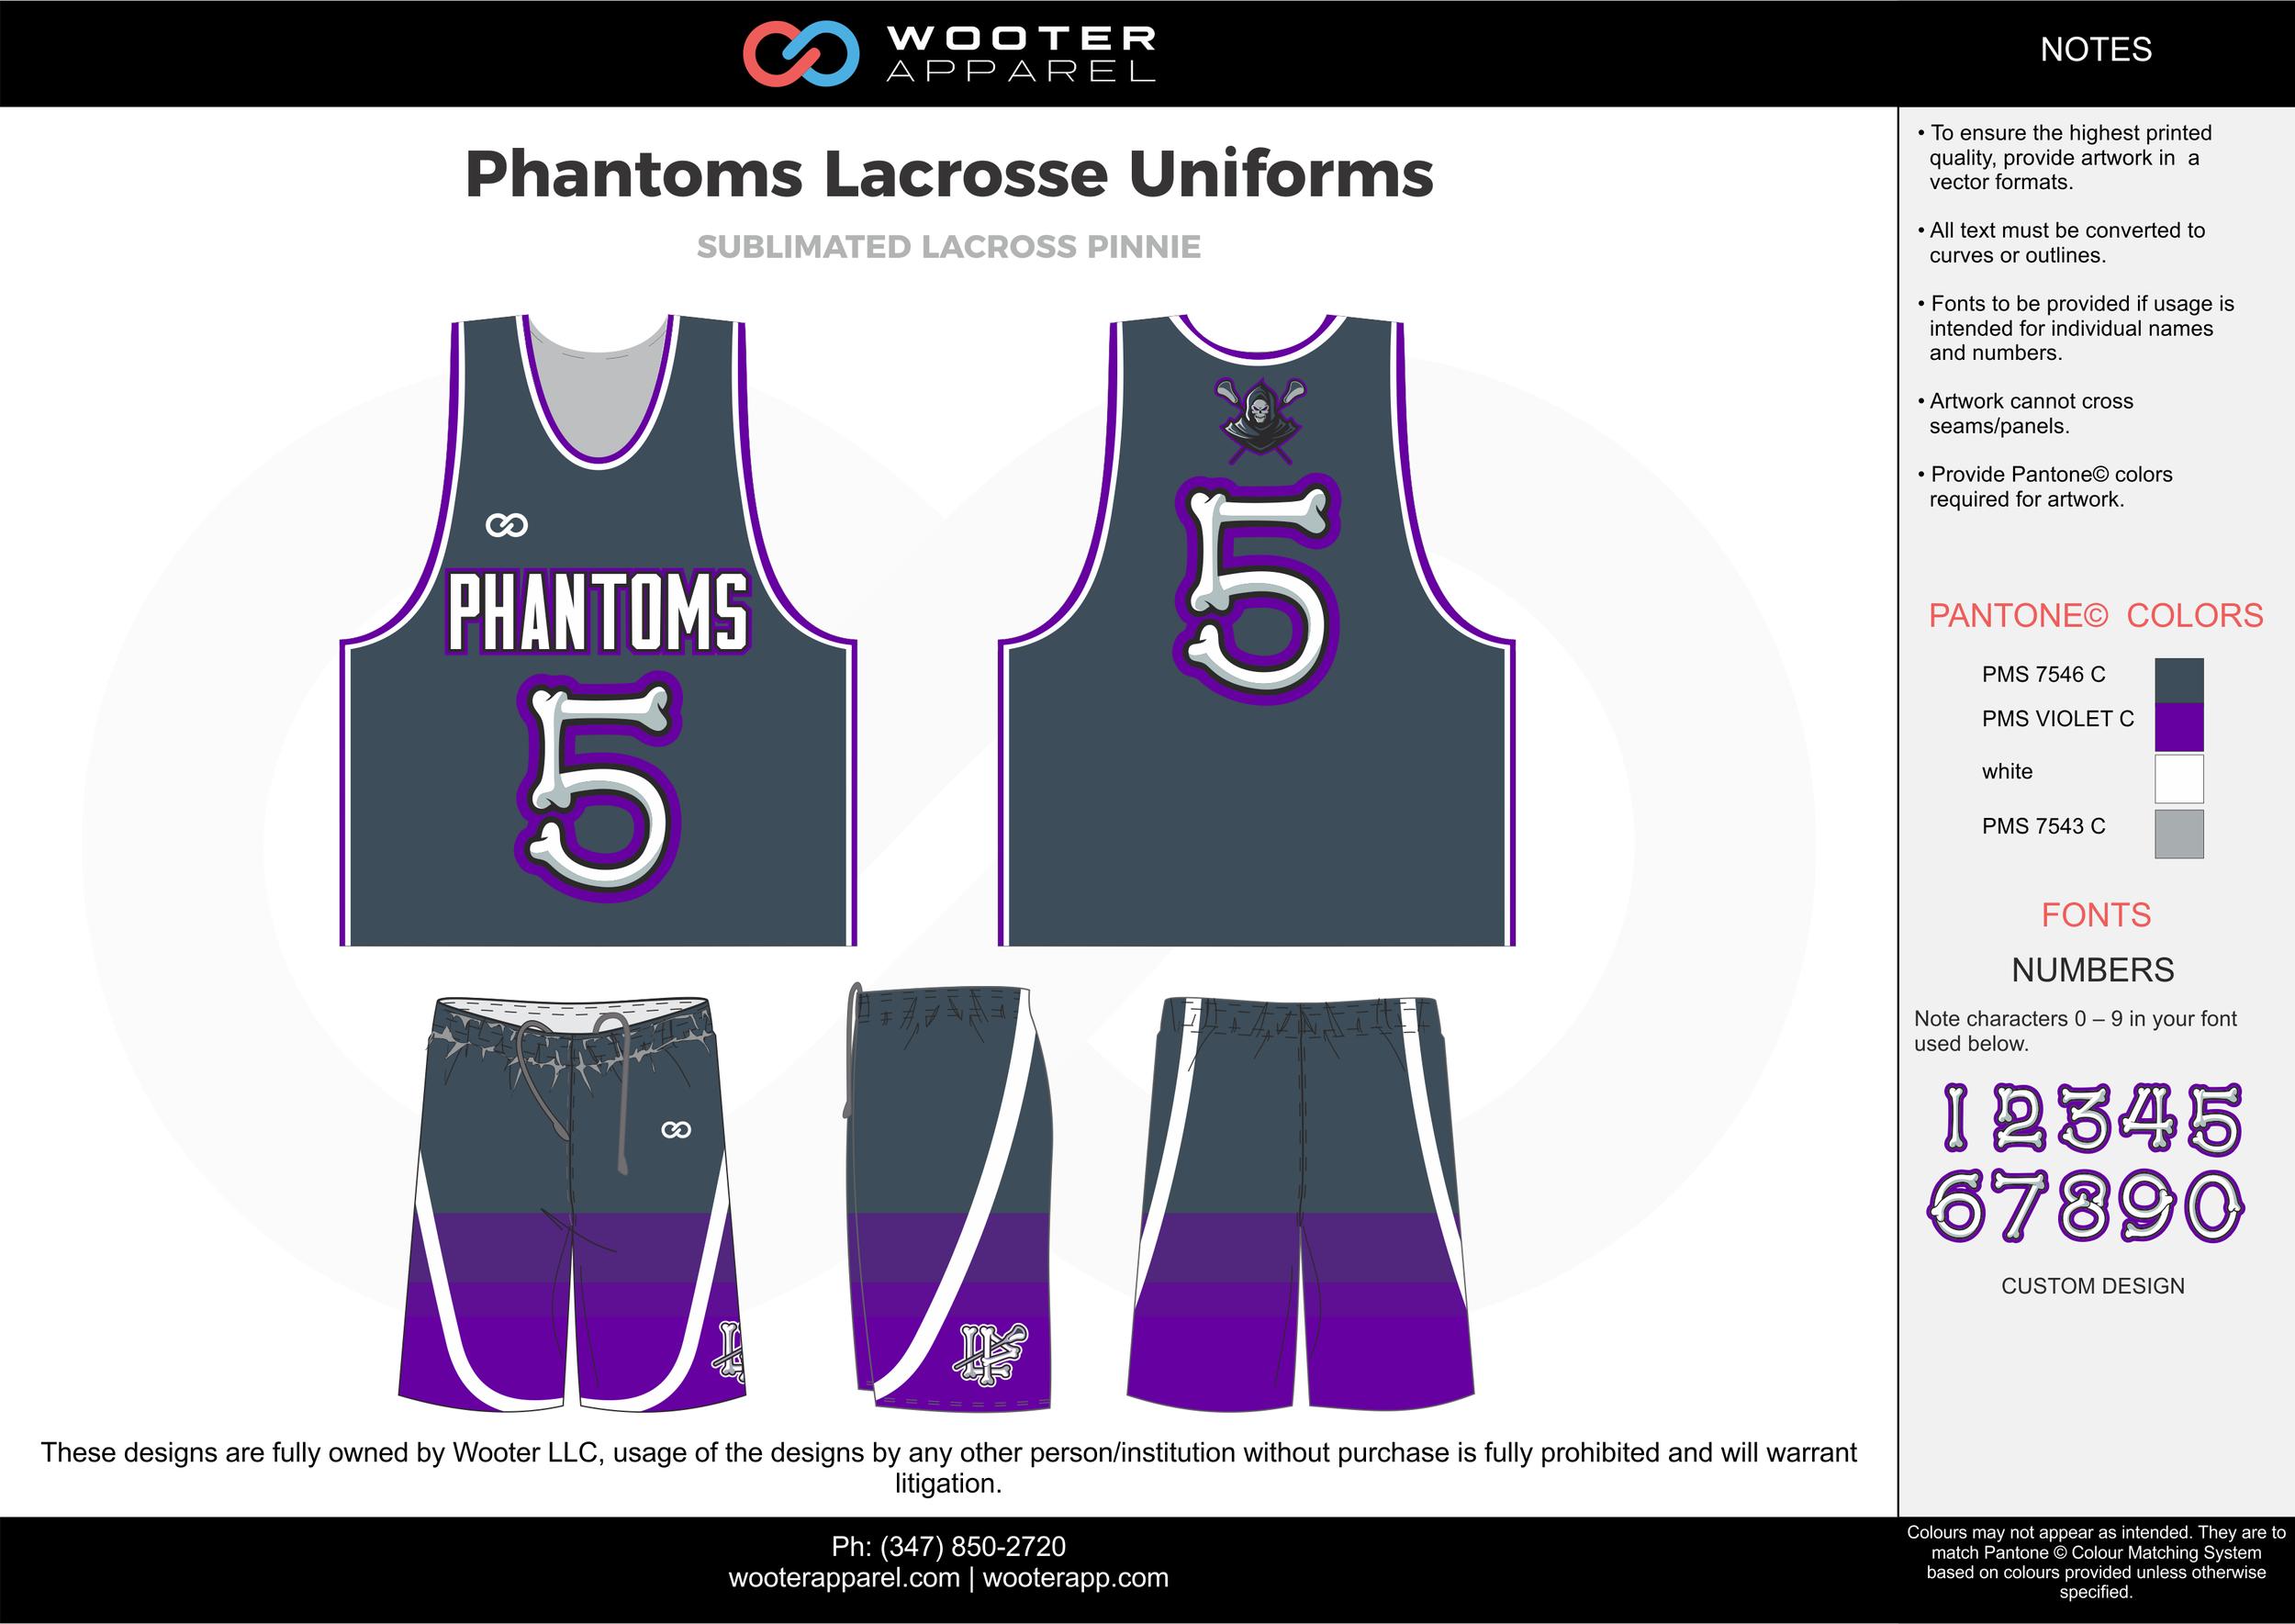 PHANTOMS LACROSSE UNIFORMS gray purple white Lacrosse uniforms pinnies jerseys shorts